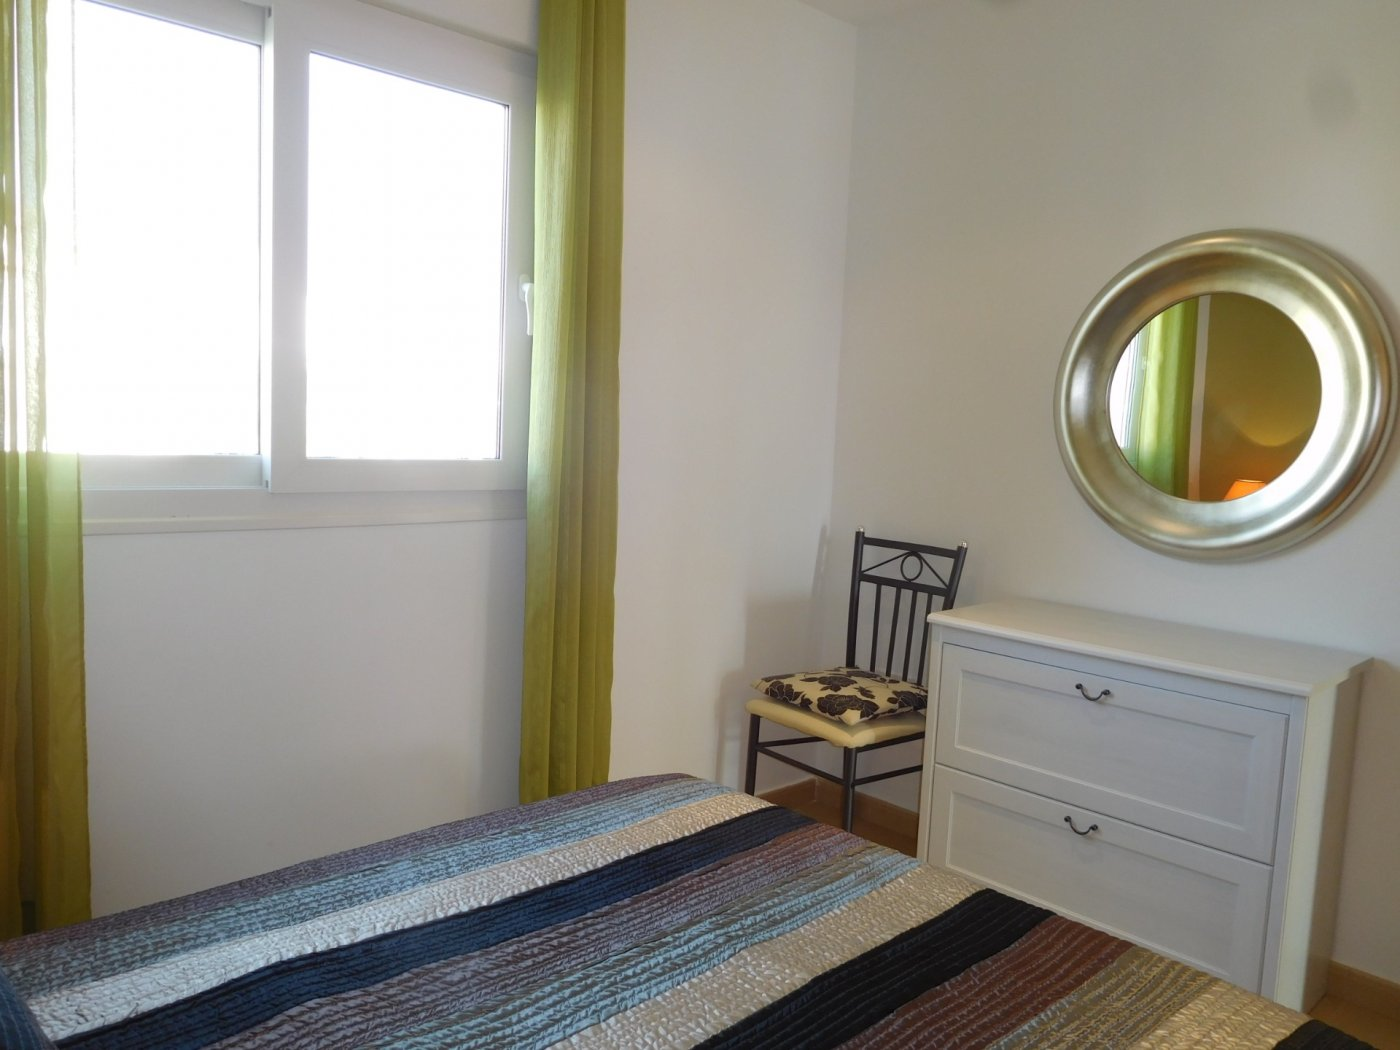 Image 8 Amarre ref 3265-03033 for rent in Condado De Alhama Spain - Quality Homes Costa Cálida